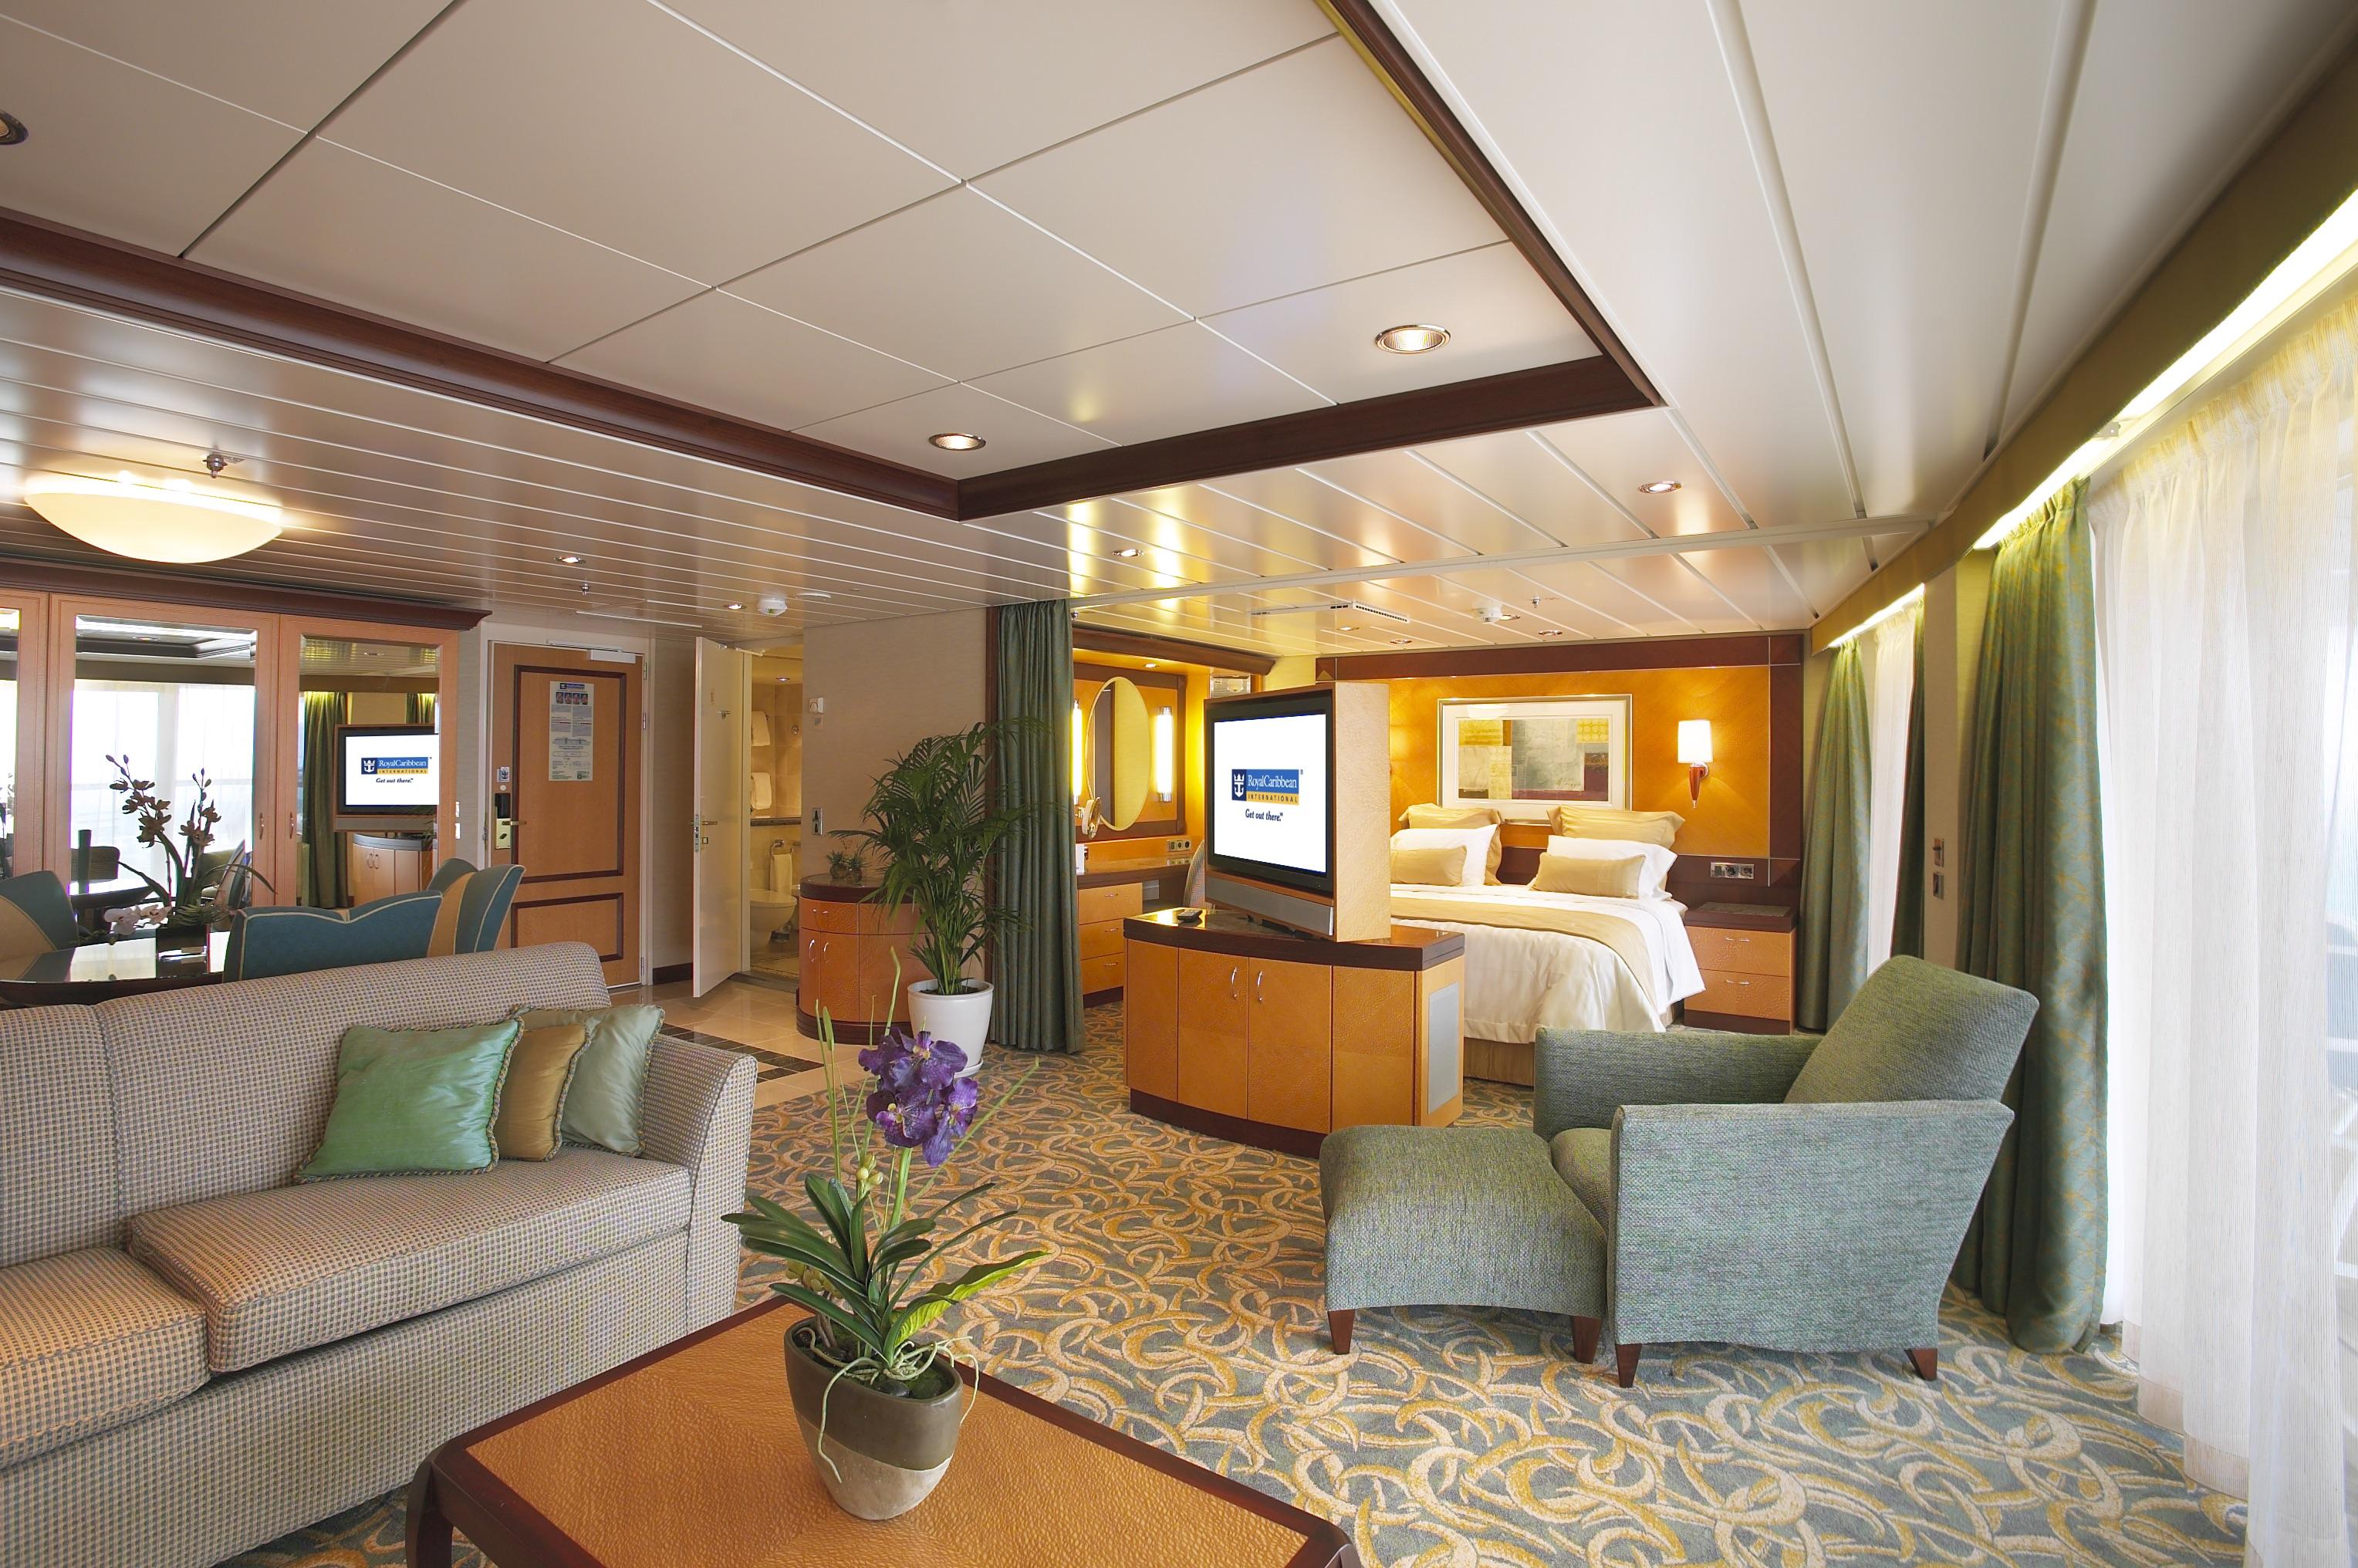 Royal Caribbean International Liberty of the seas Accommodation RCI_LB_Owners_Suite.jpeg